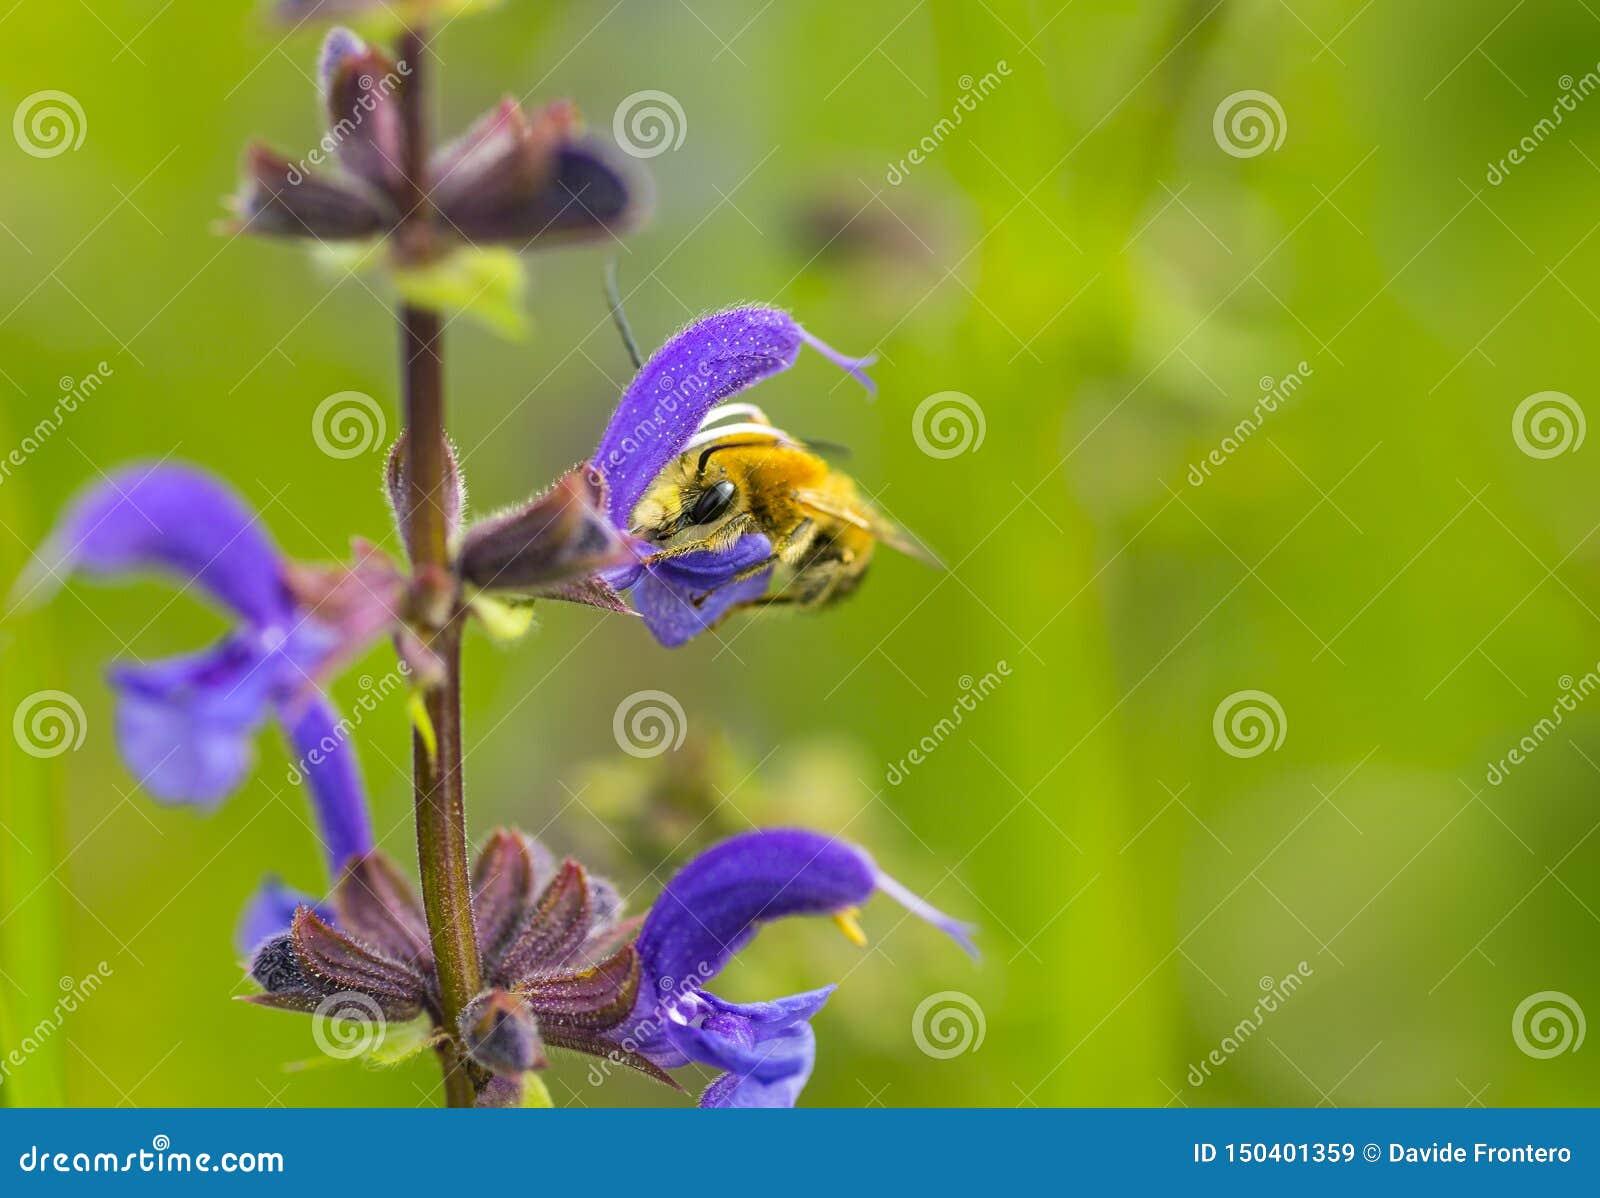 Solitario salvaje de la antena larga de la abeja